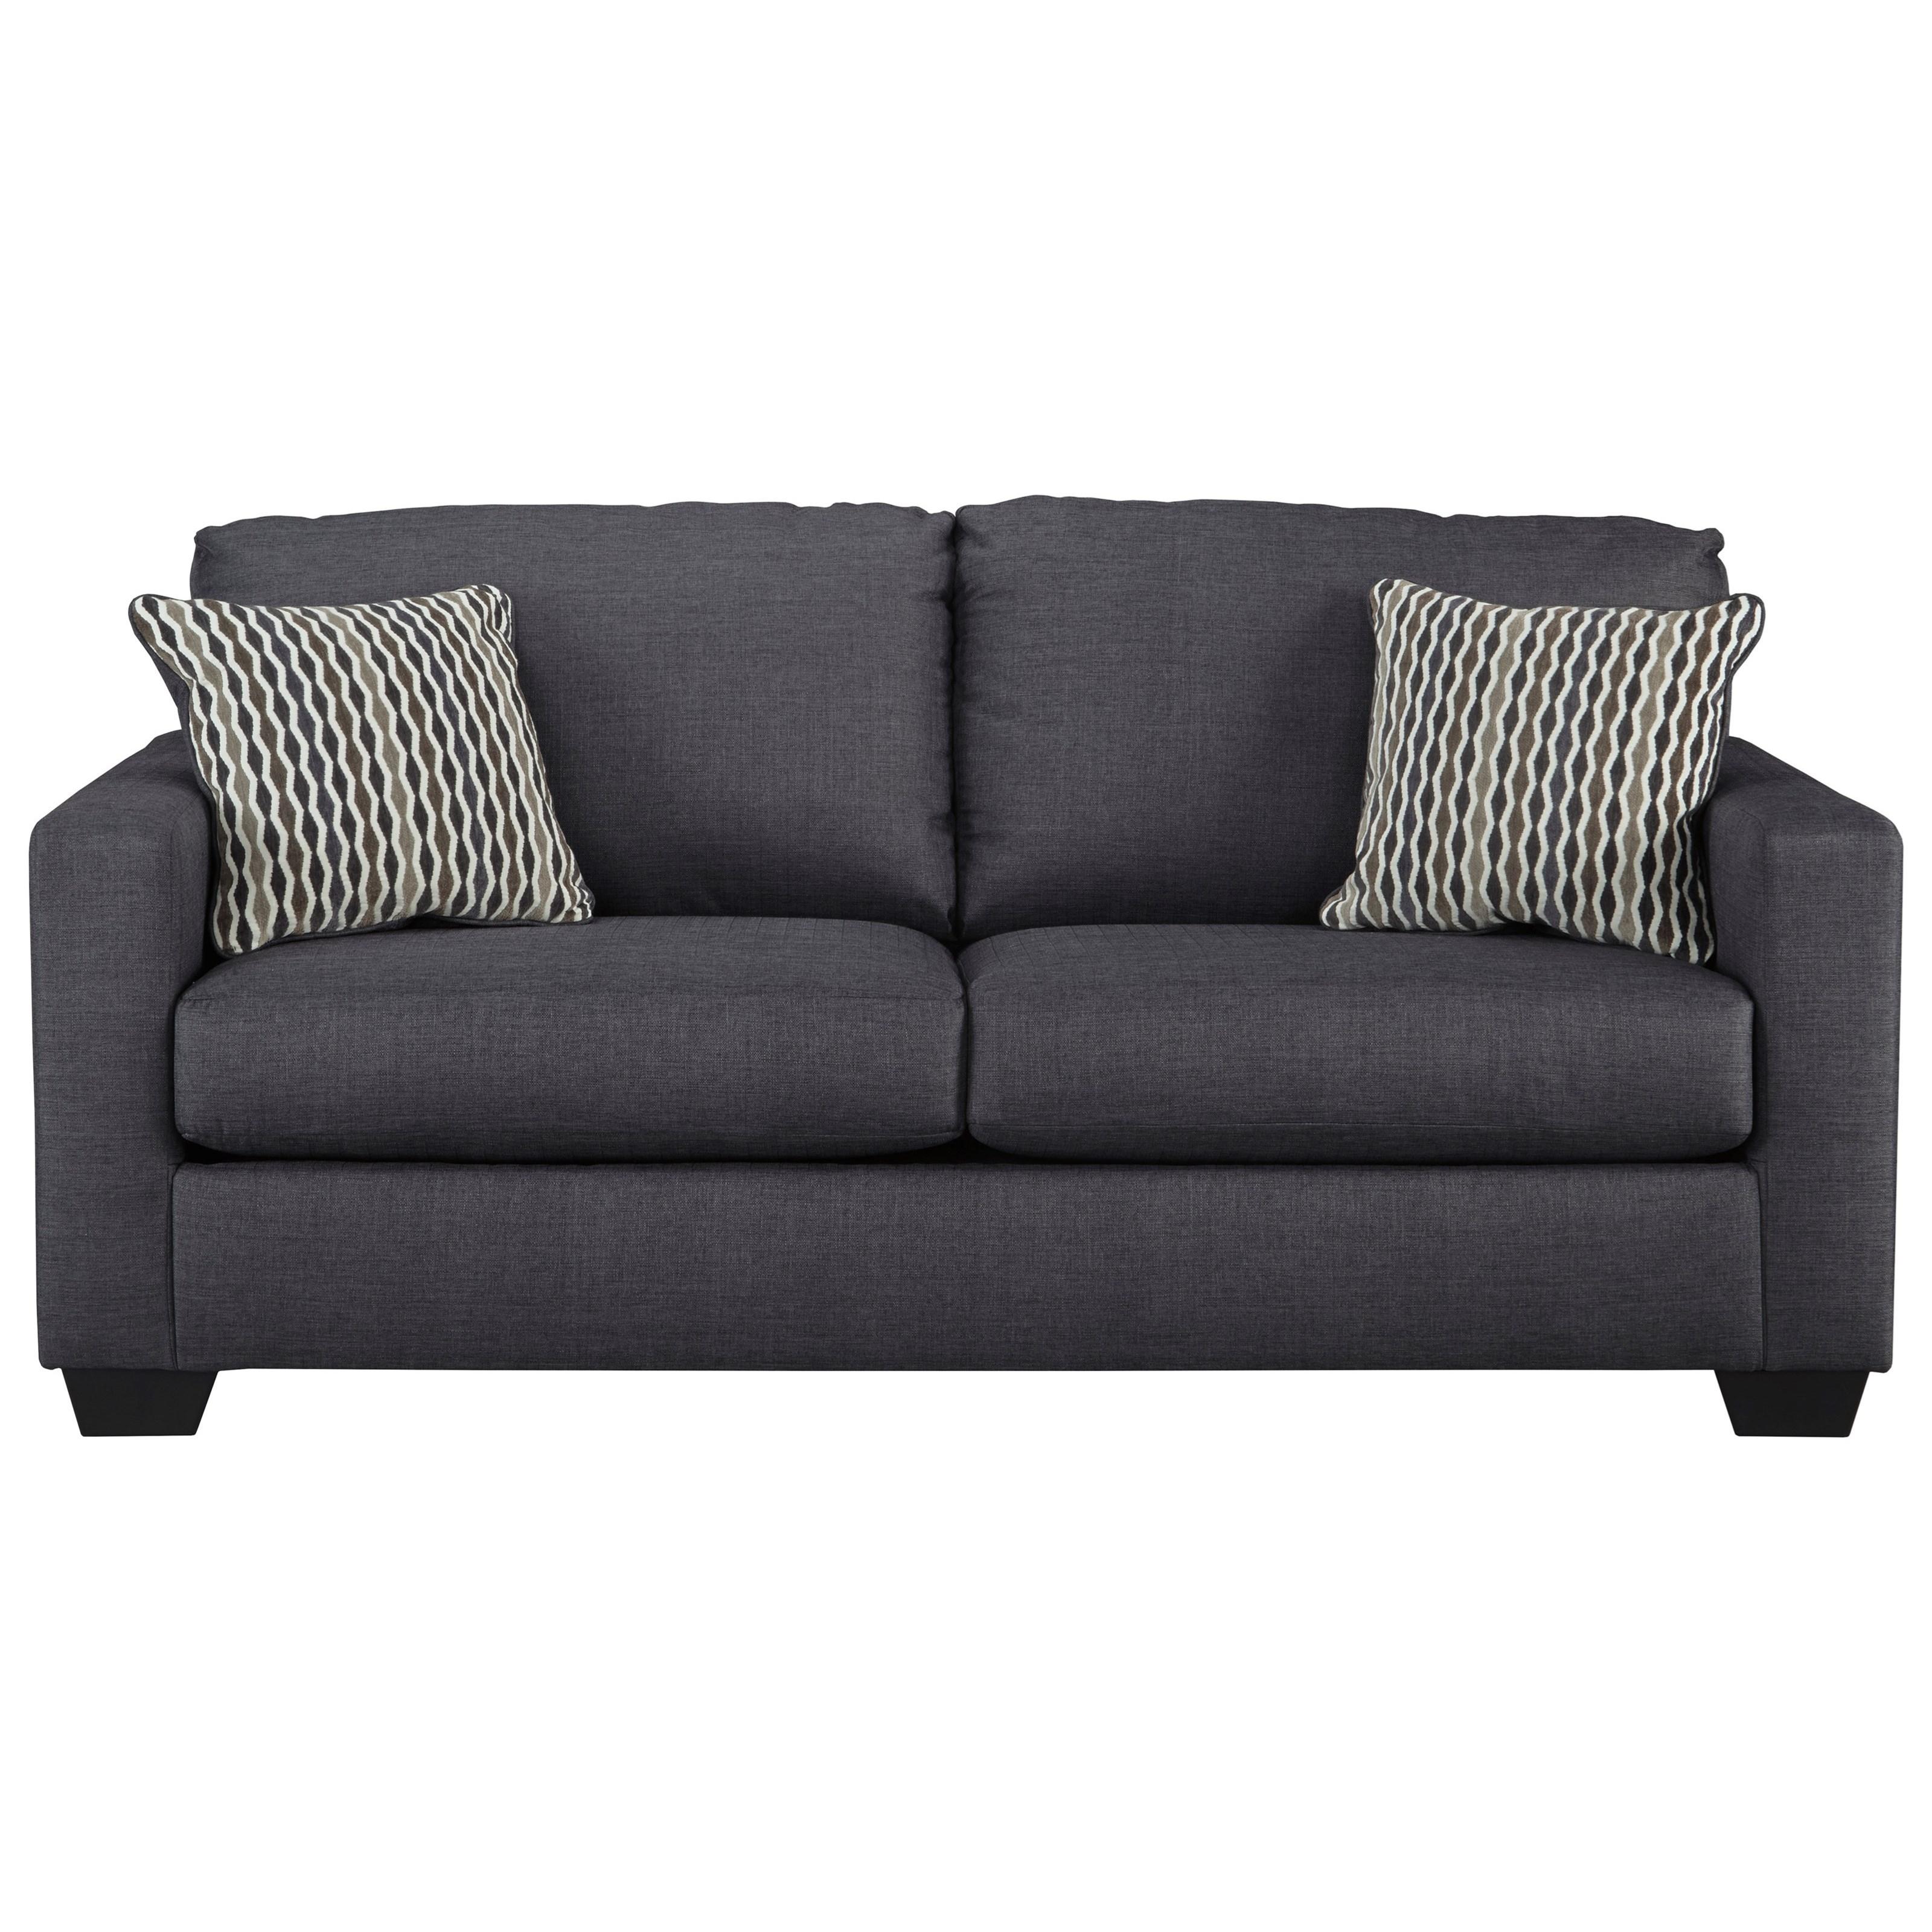 Benchcraft Bavello Sofa - Item Number: 9730138